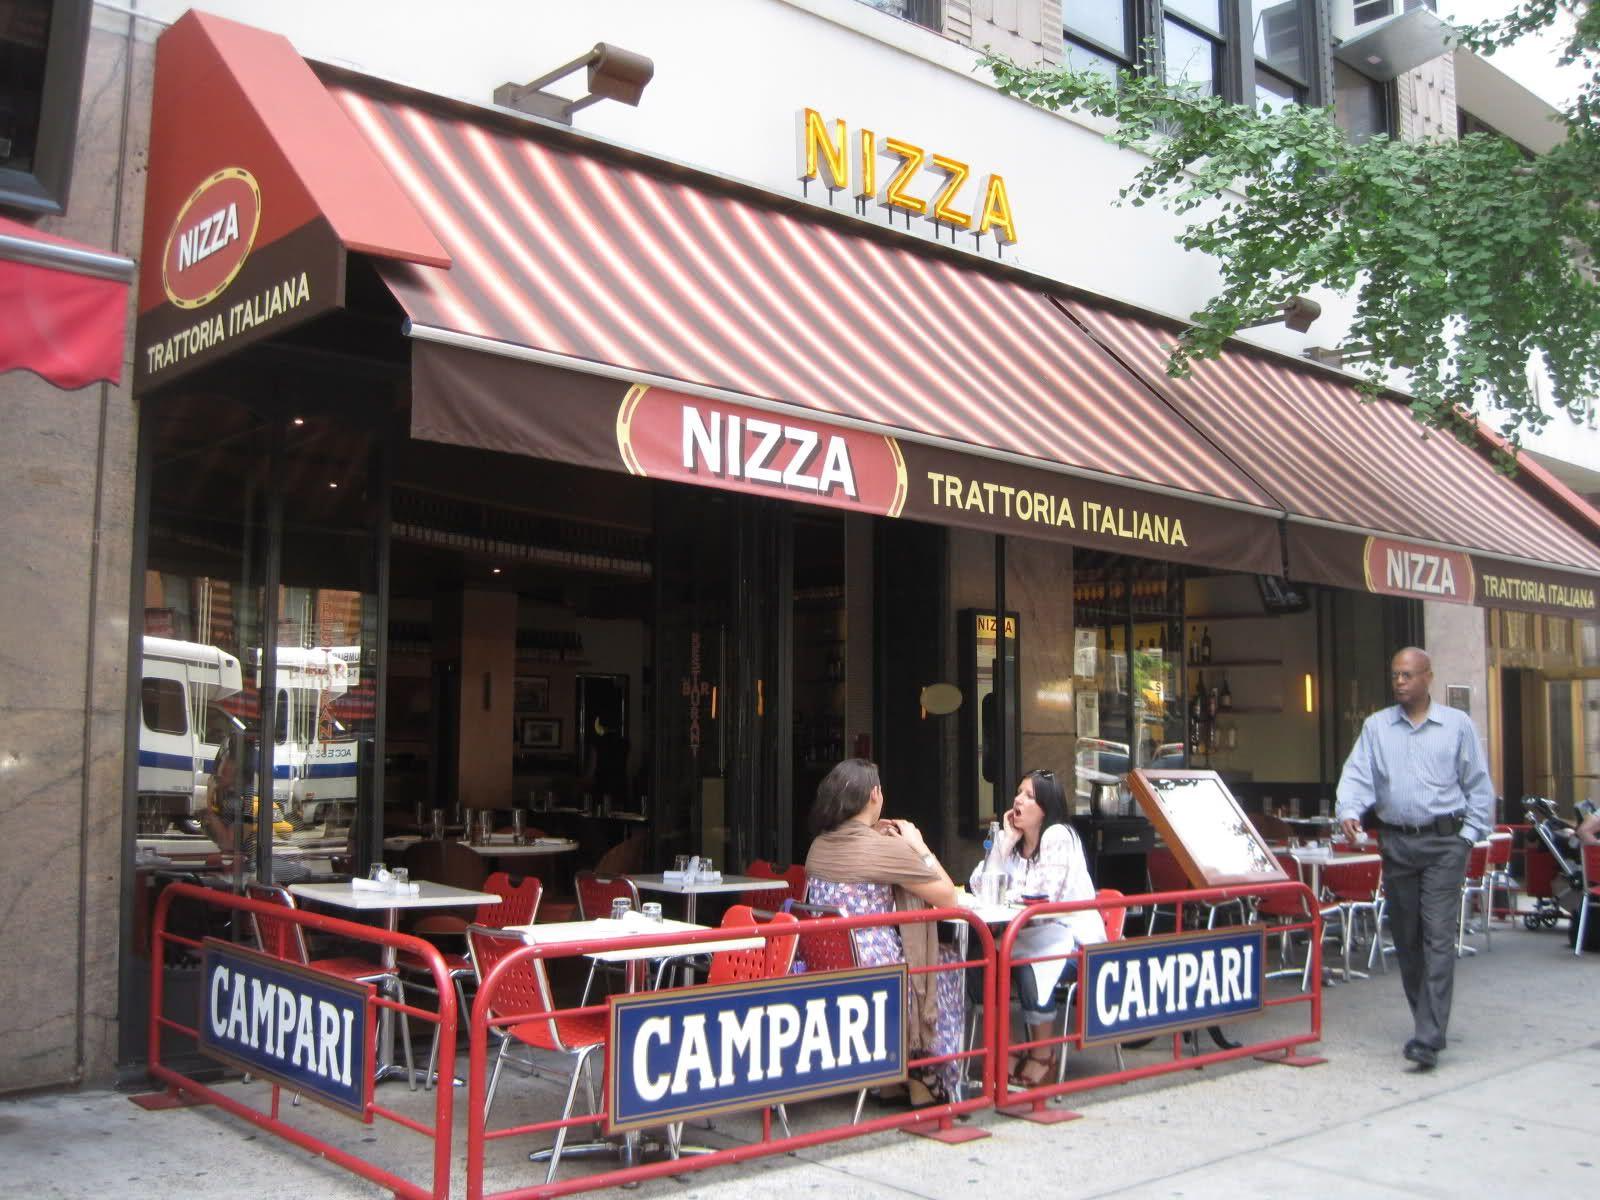 Nizza New York City Triumph Dining Gluten Free Restaurants Gluten Free Dining New York City